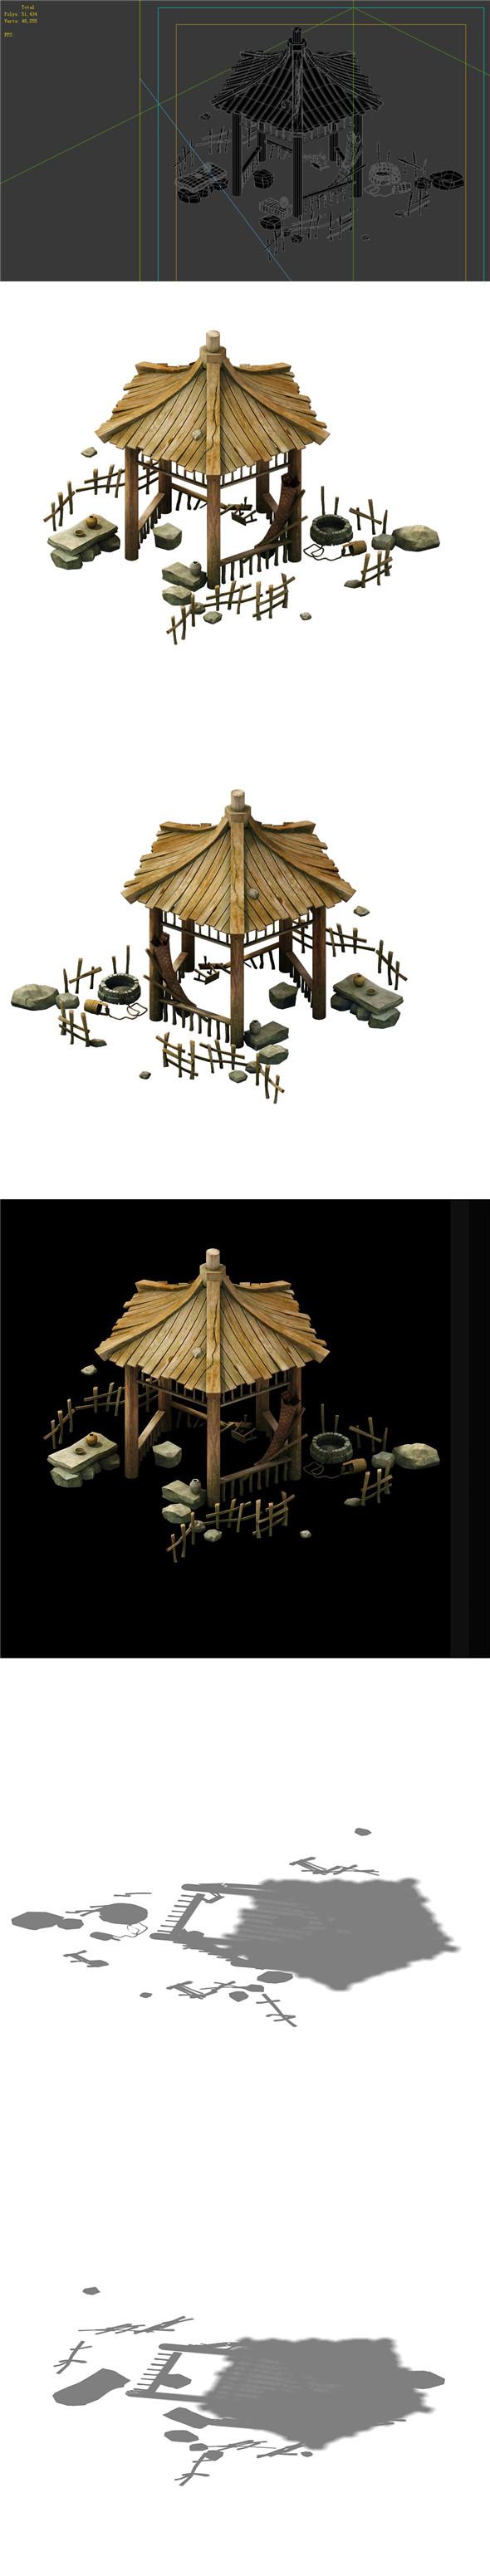 Game Model - prairie scene - wooden gazebo 02 01 - 3DOcean Item for Sale